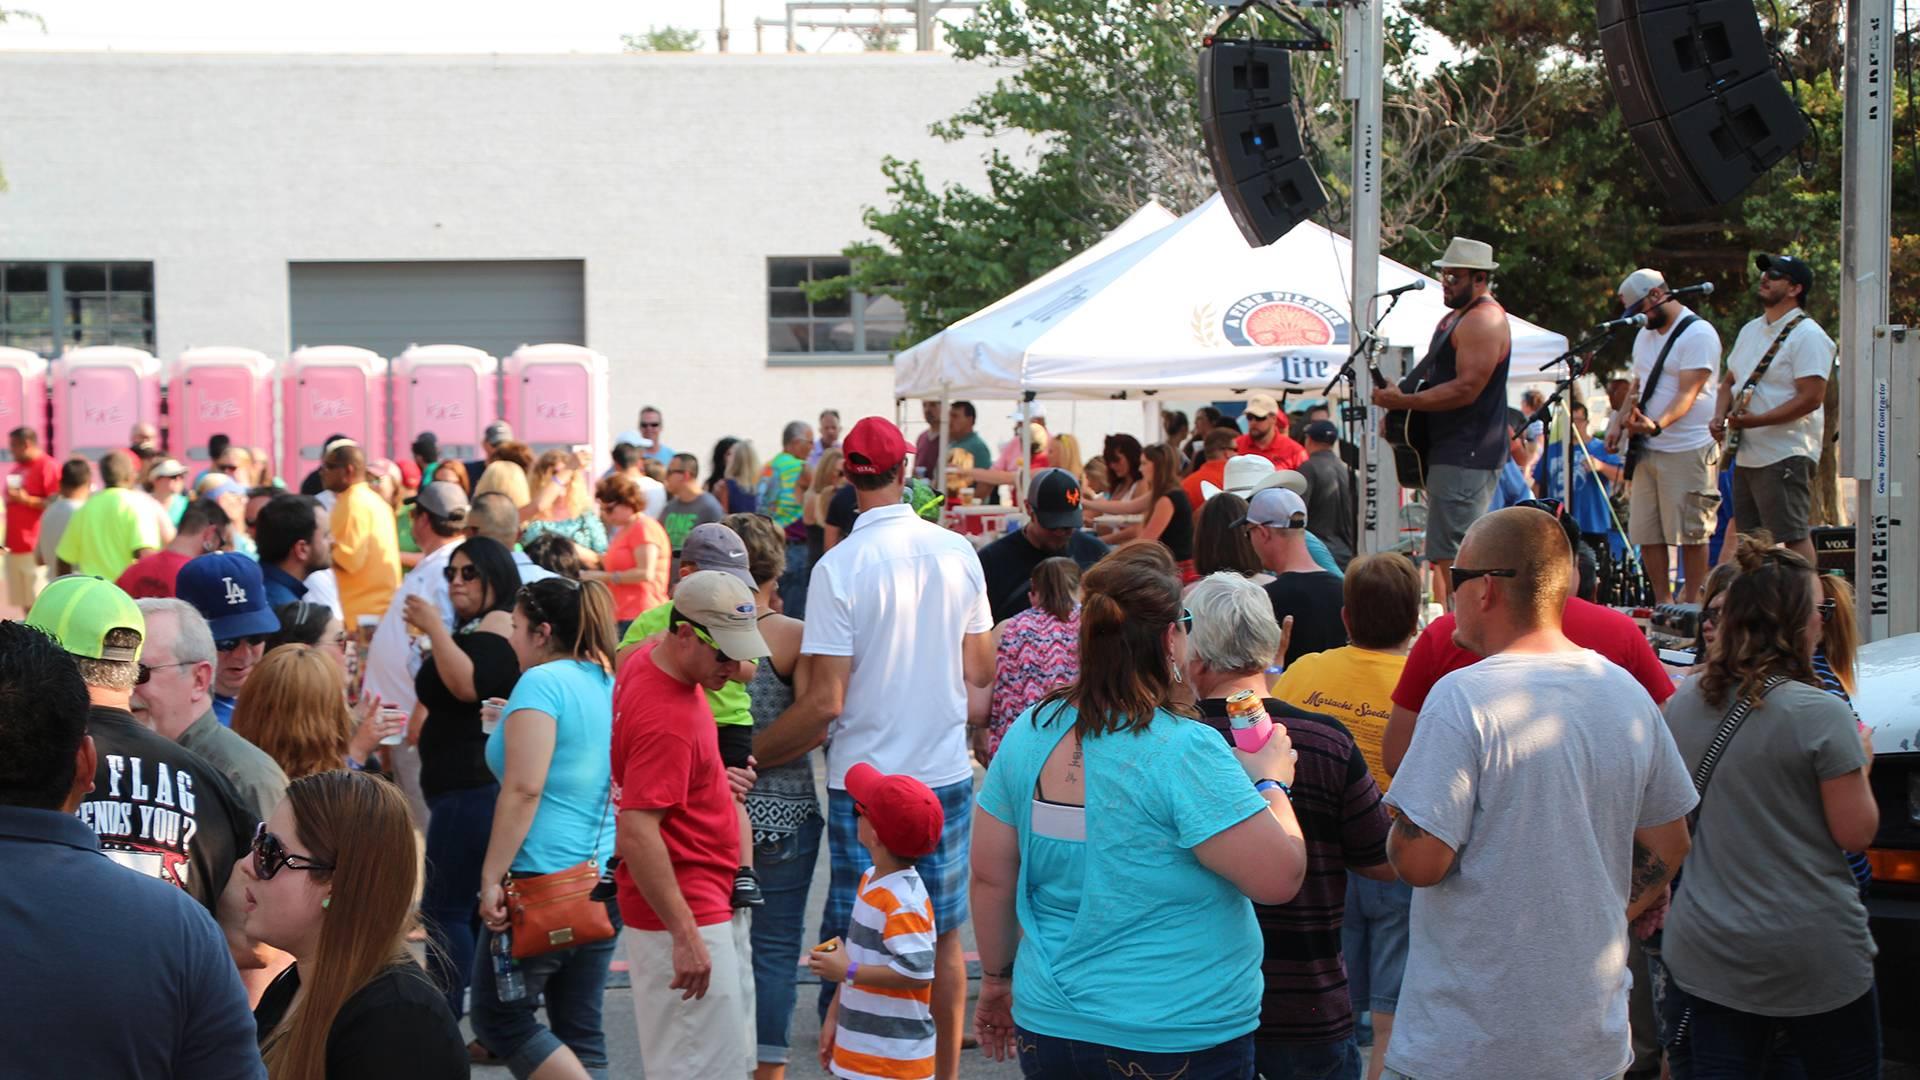 Restaurant roundup amarillo 2017 - Amarillo Chamber S Annual Summer Celebration Returns June 15